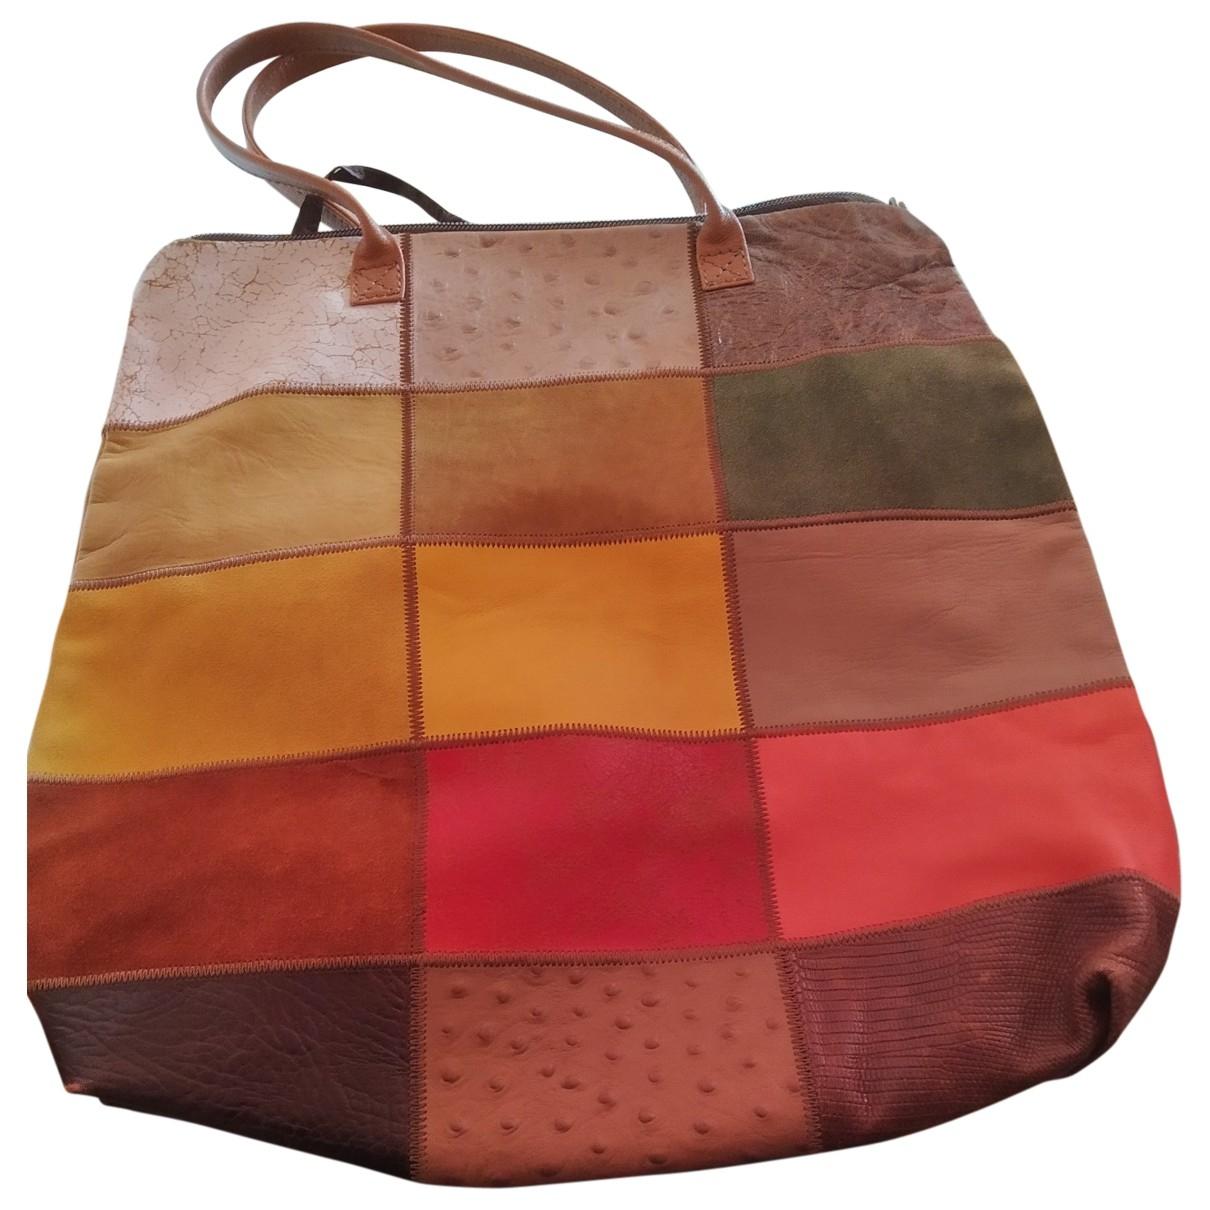 Maliparmi \N Handtasche in  Bunt Leder